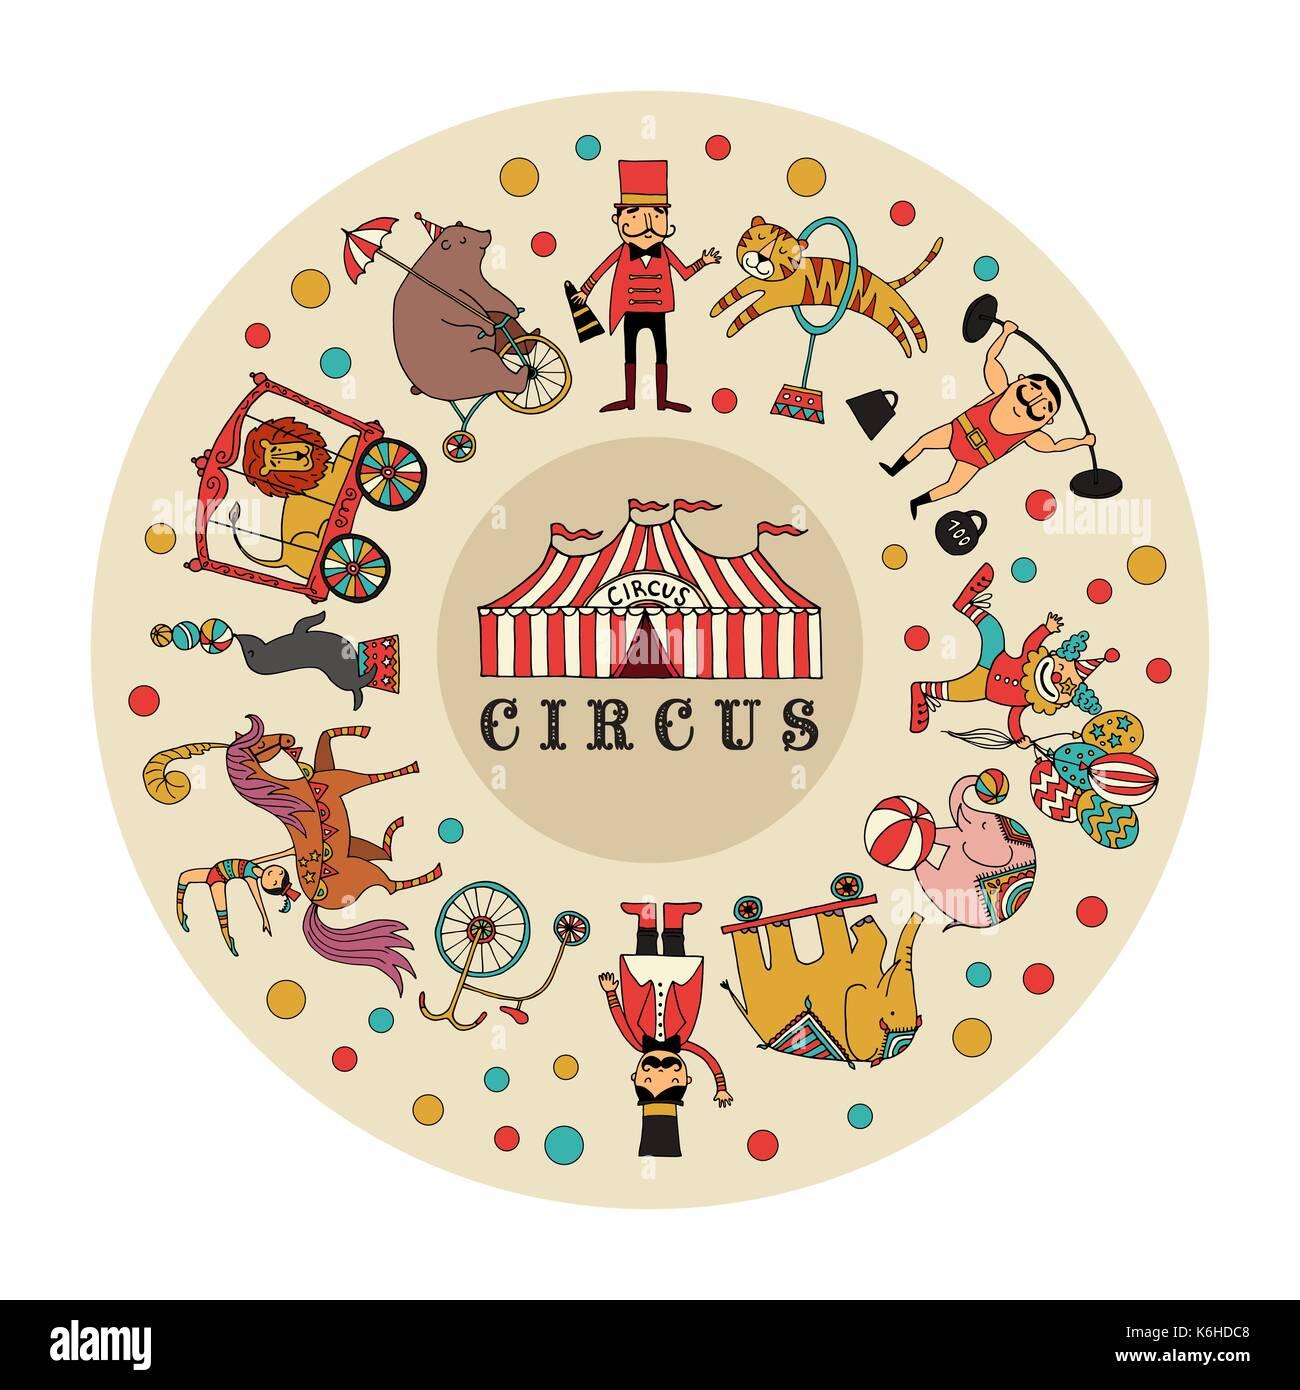 Circus, vector illustration - Stock Image